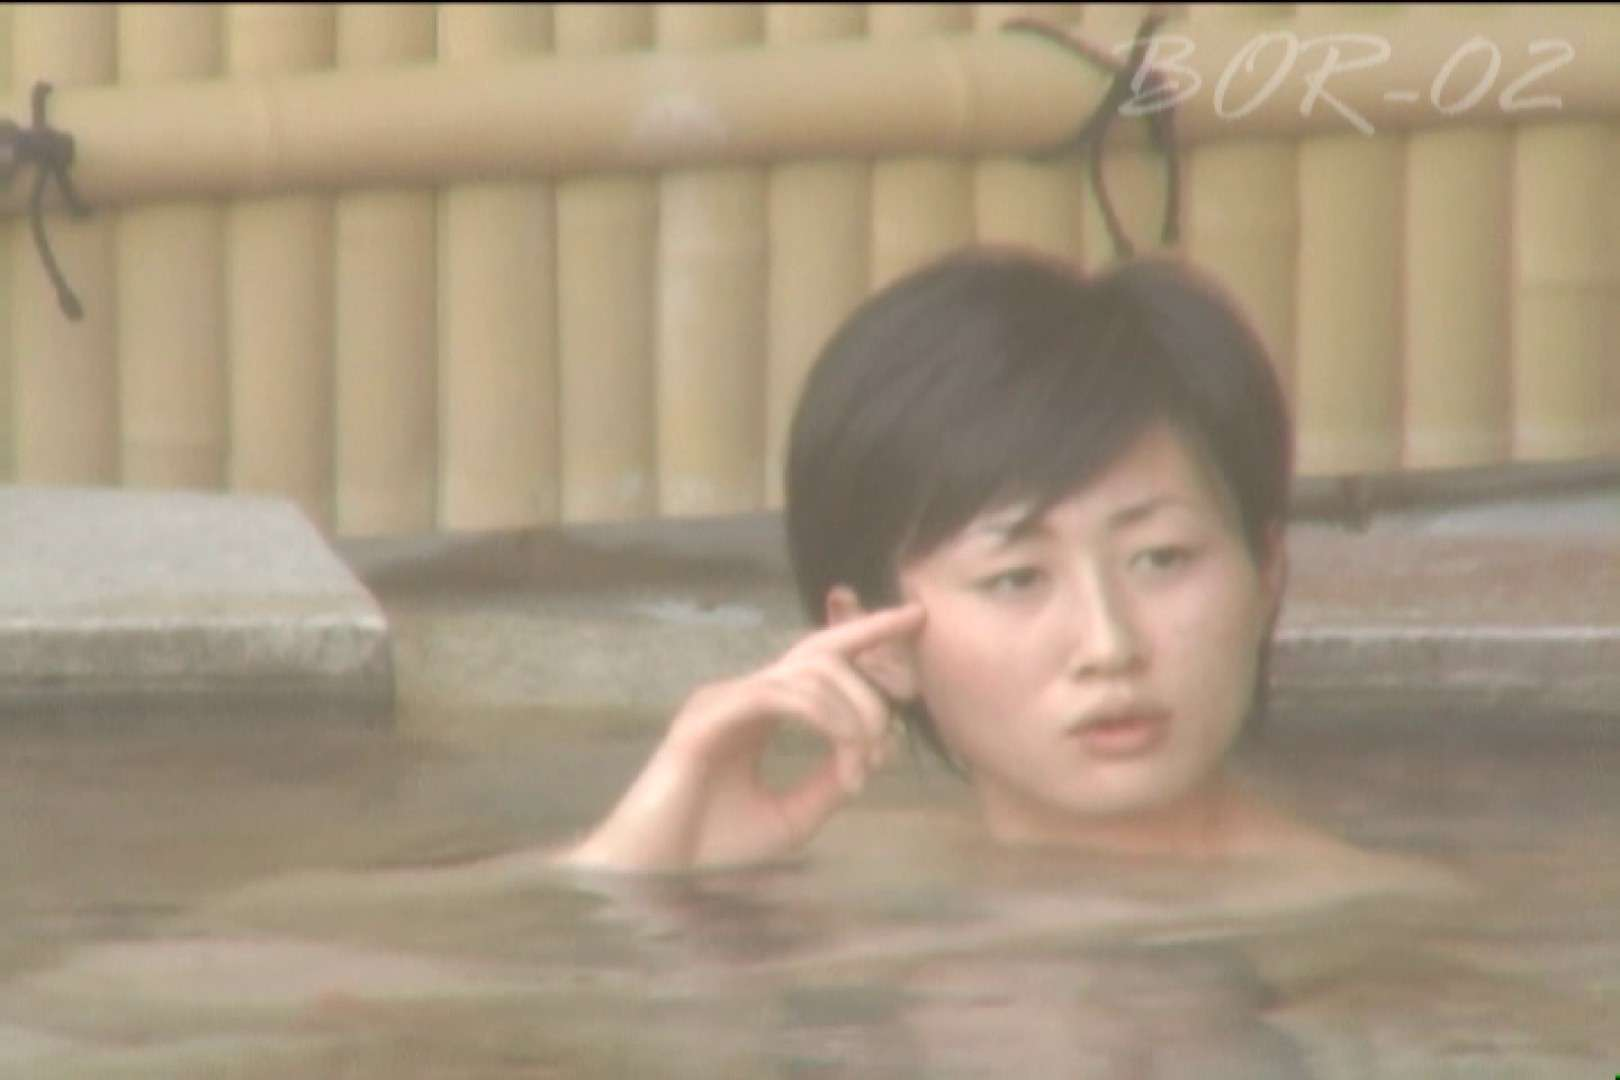 Aquaな露天風呂Vol.480 0  44連発 38